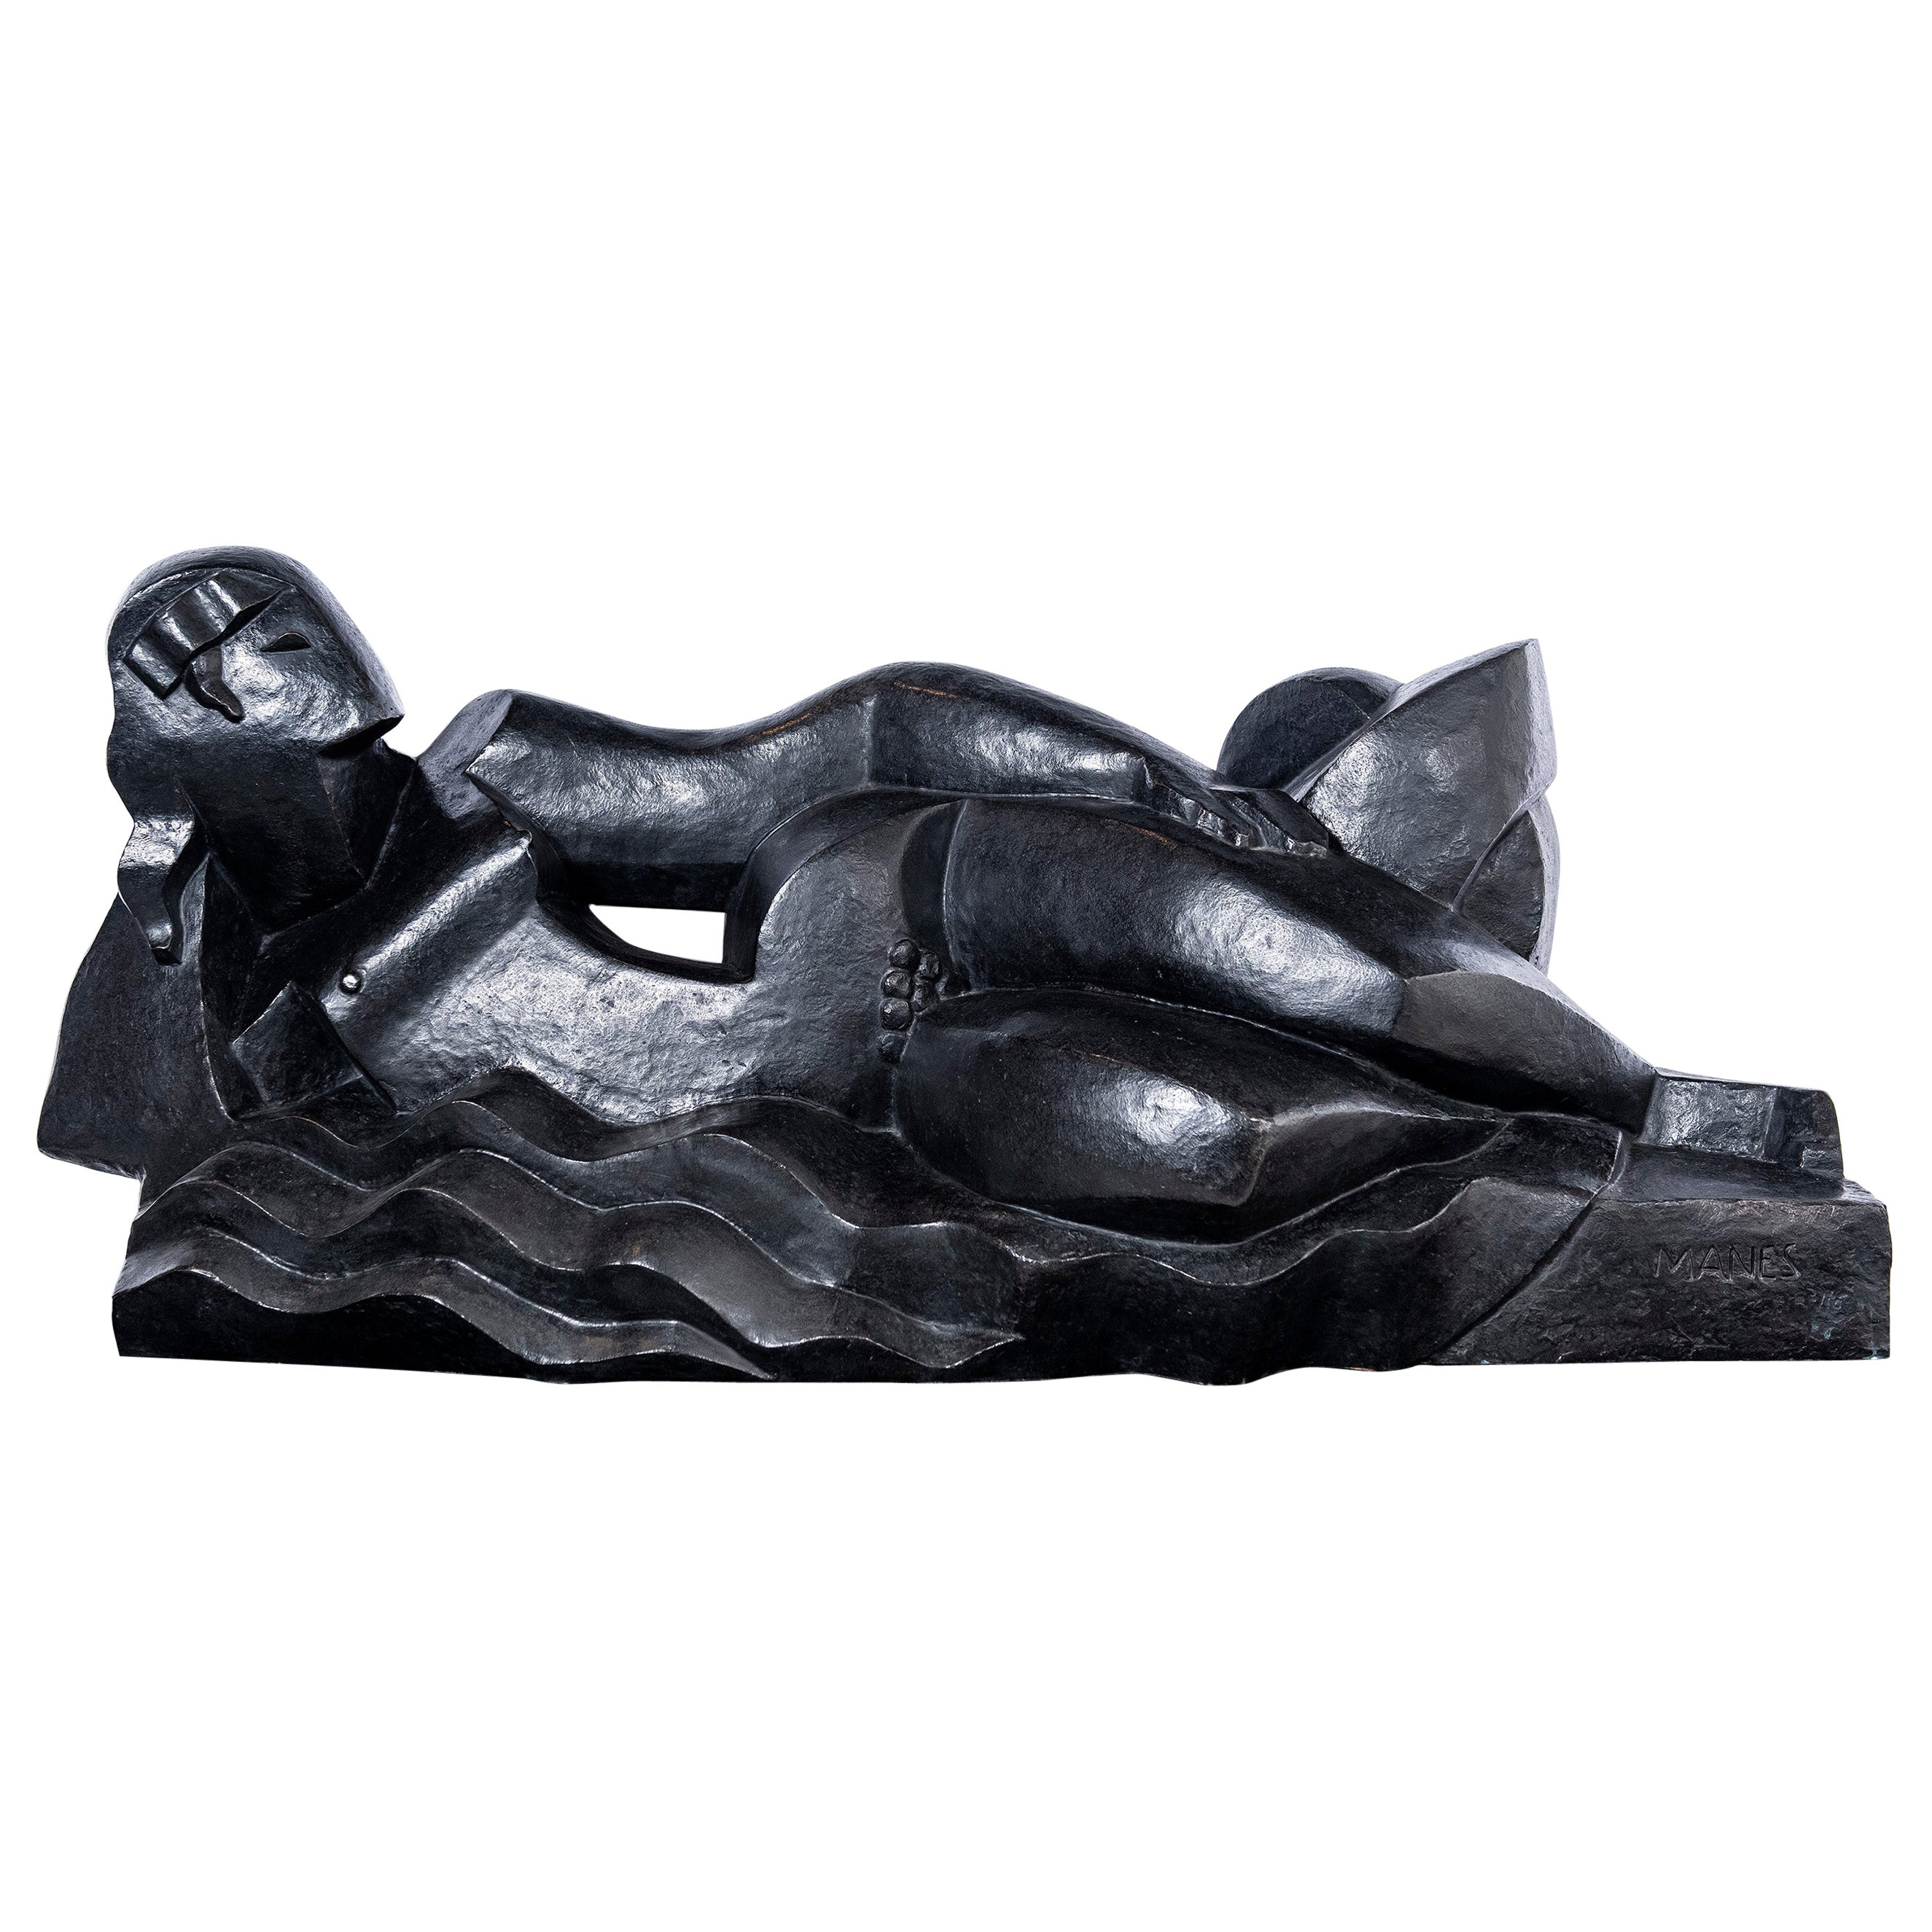 "Pablo Curatella Manes Cast Bronze Sculpture, ""Ninfa recostada"", Paris, 1924"